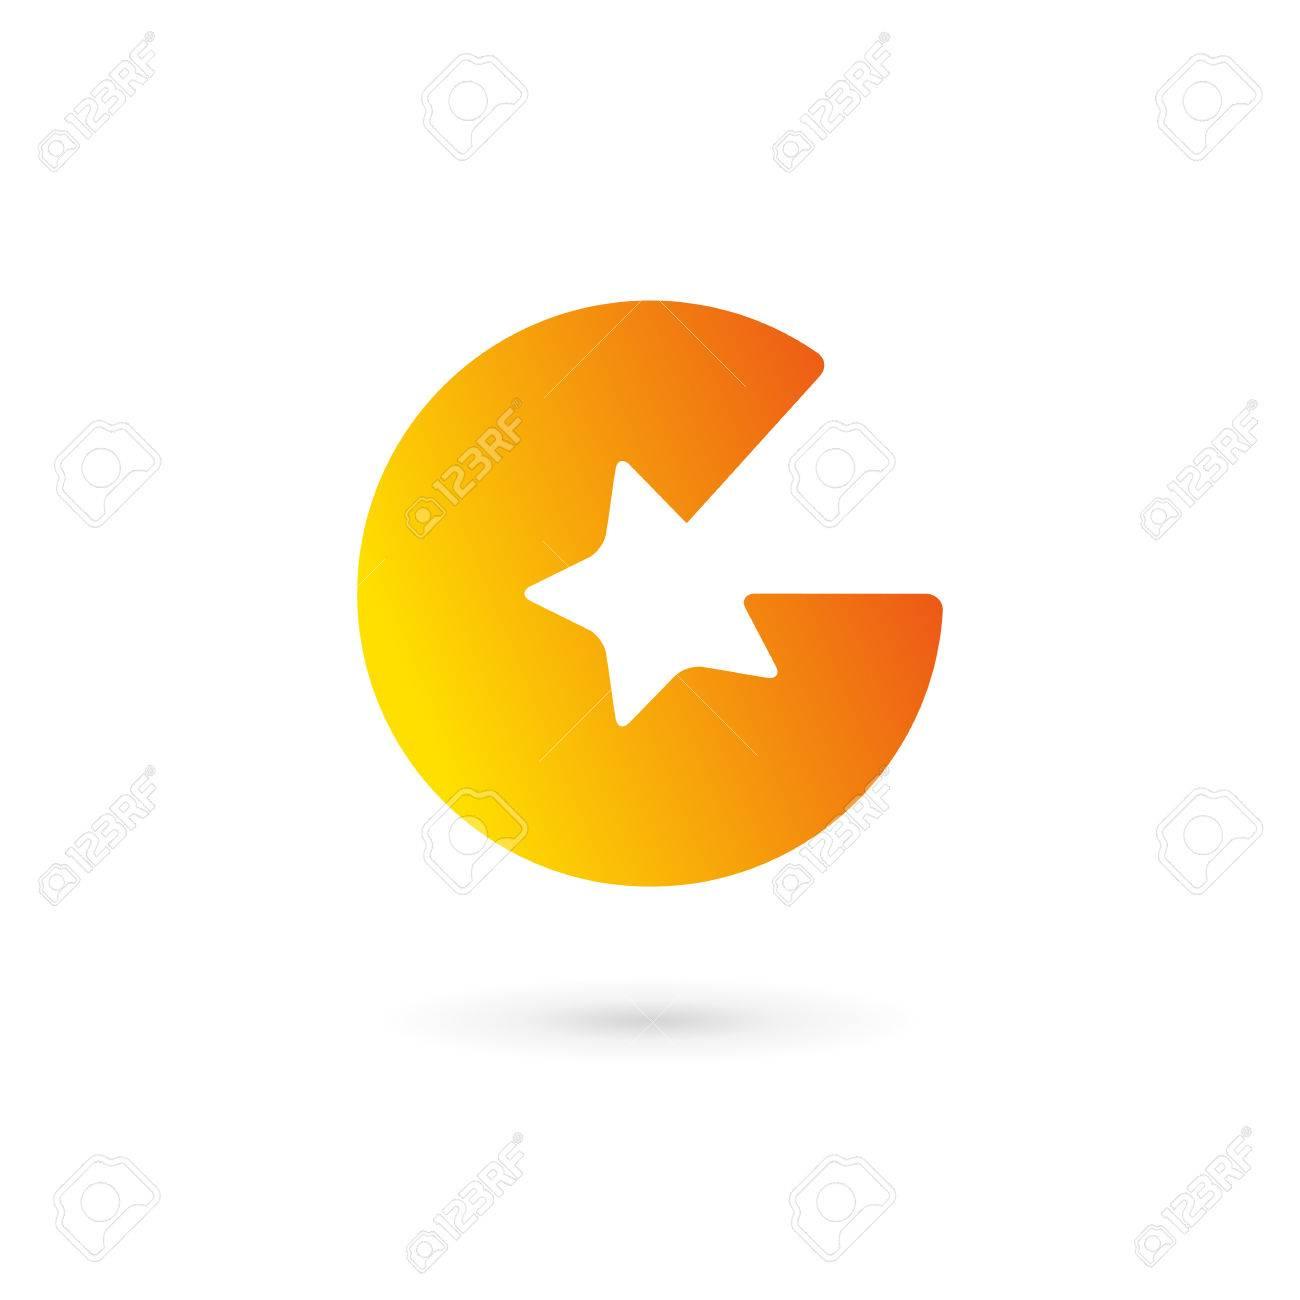 Letter g icon design template elements royalty free cliparts letter g icon design template elements stock vector 36851465 maxwellsz